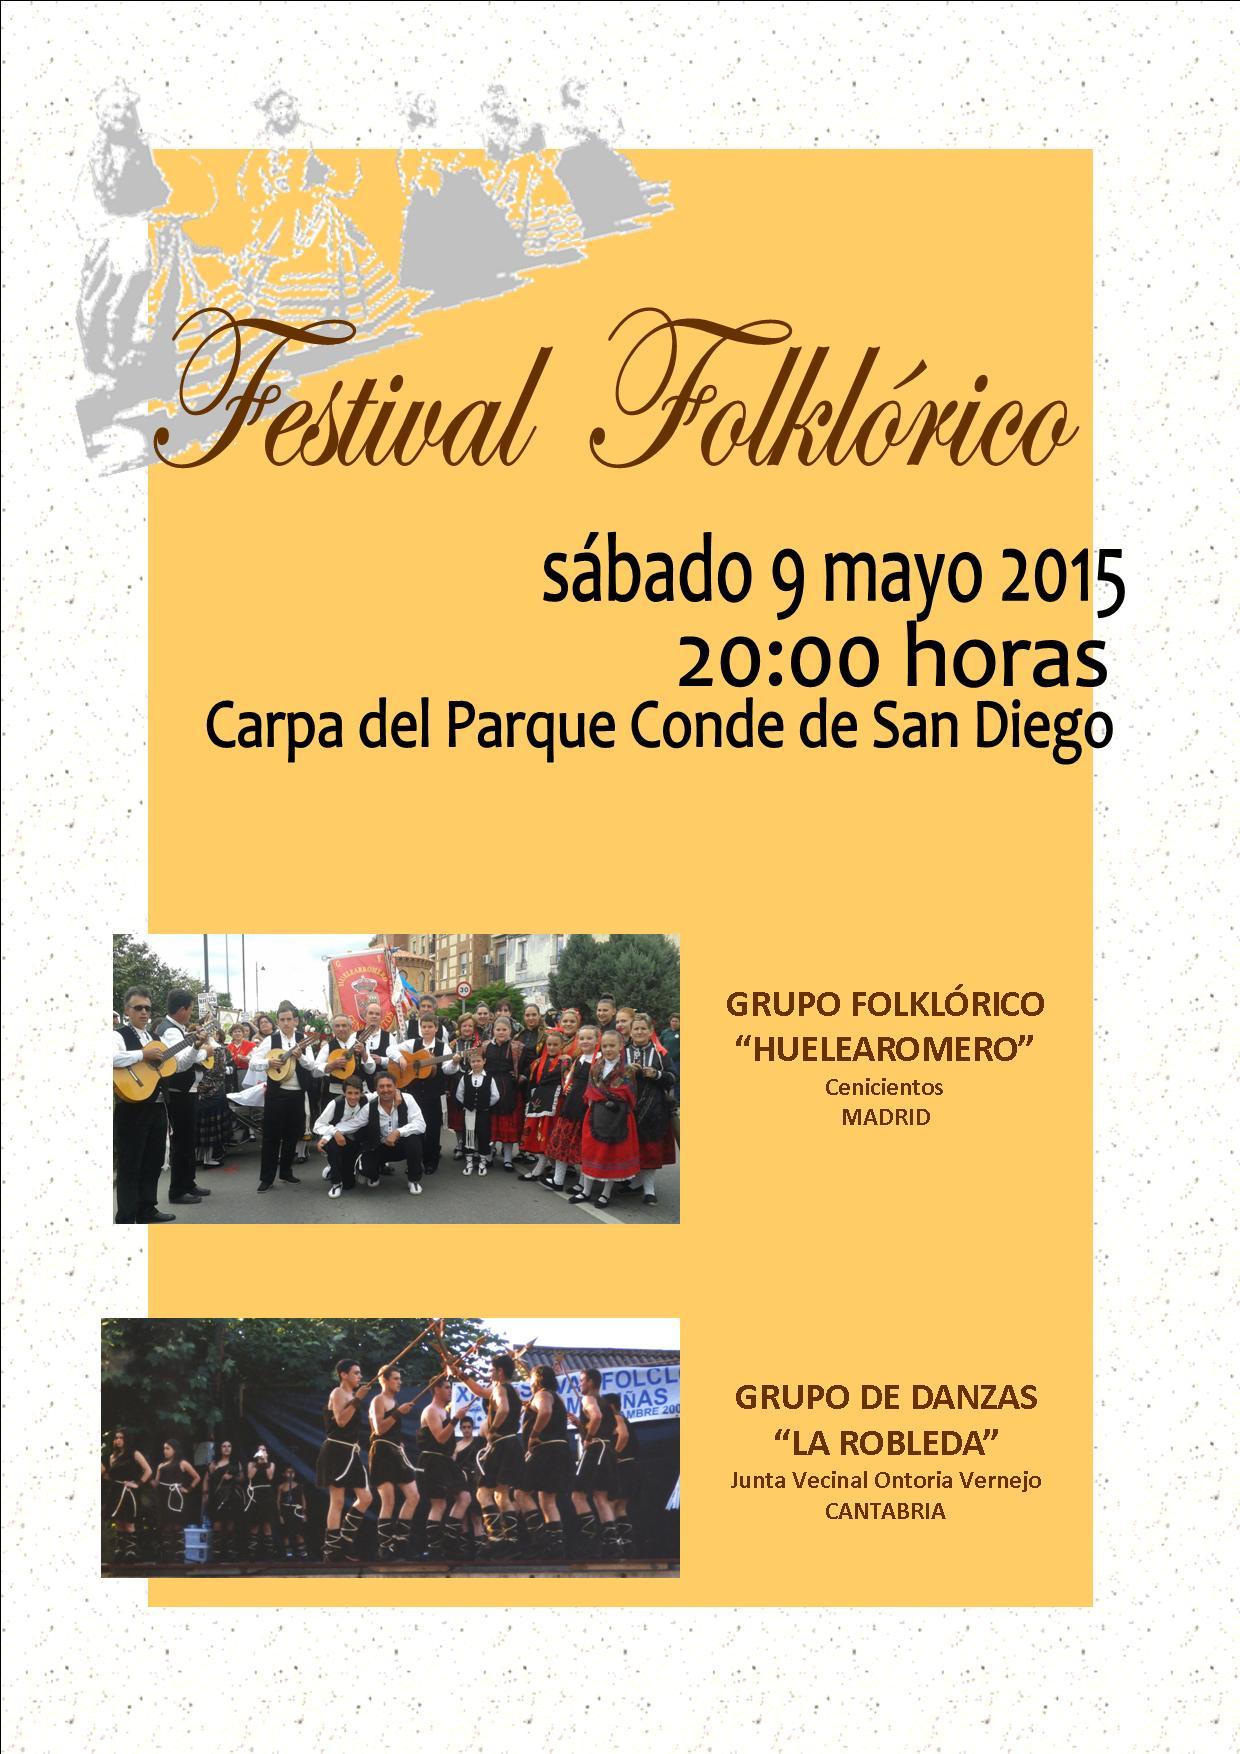 http://www.cabezondelasal.net/wp-content/uploads/2015/05/cartel-festival-esther.jpg